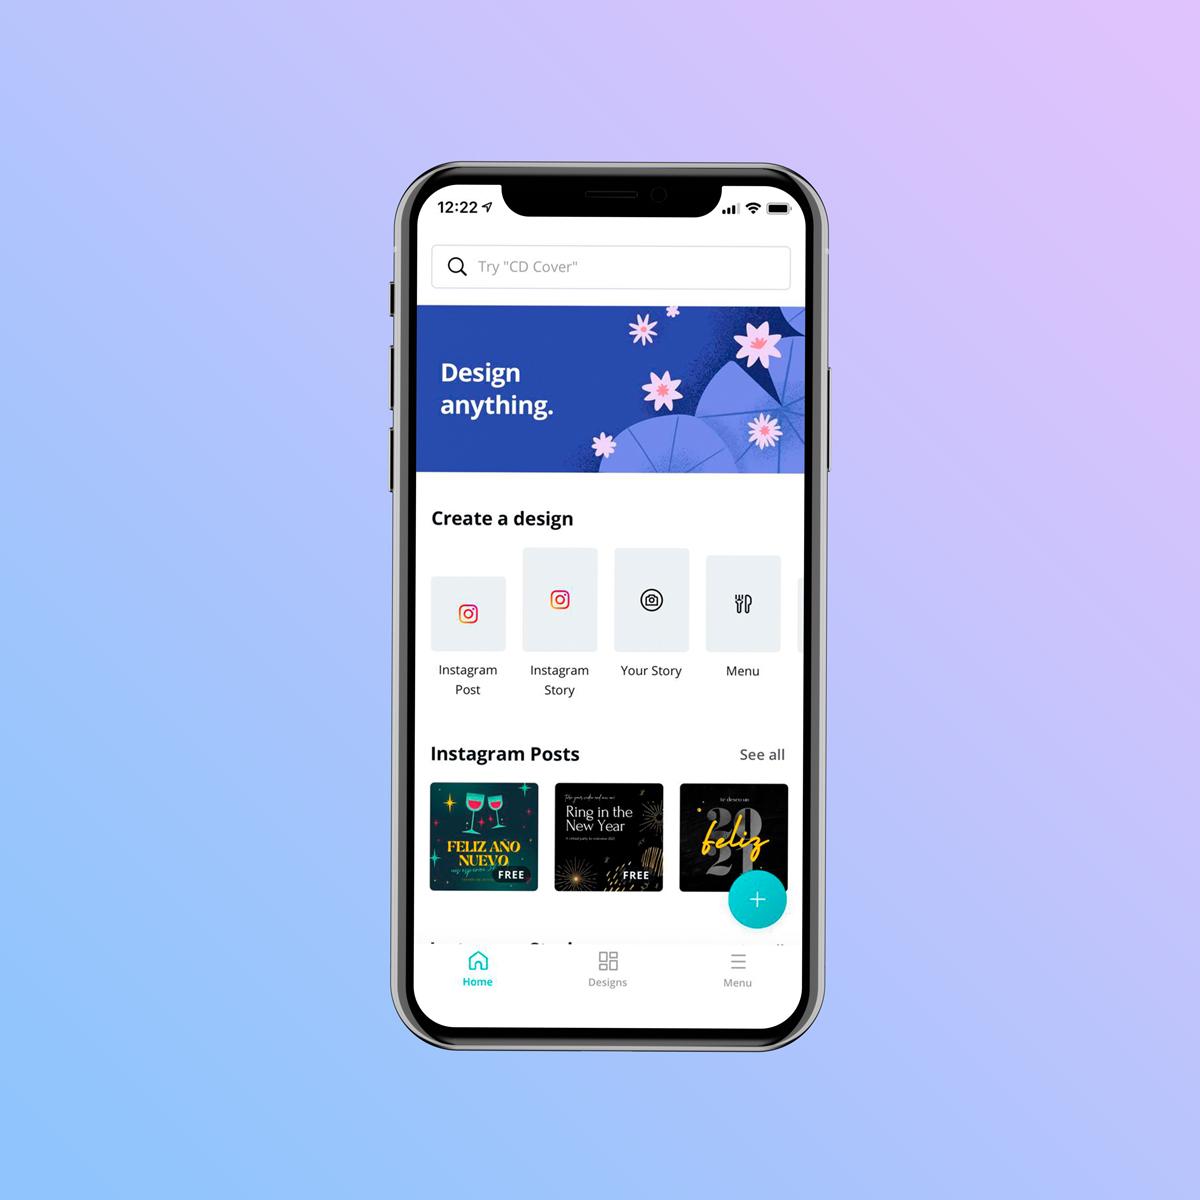 A screenshot of Canva's Mobile App.